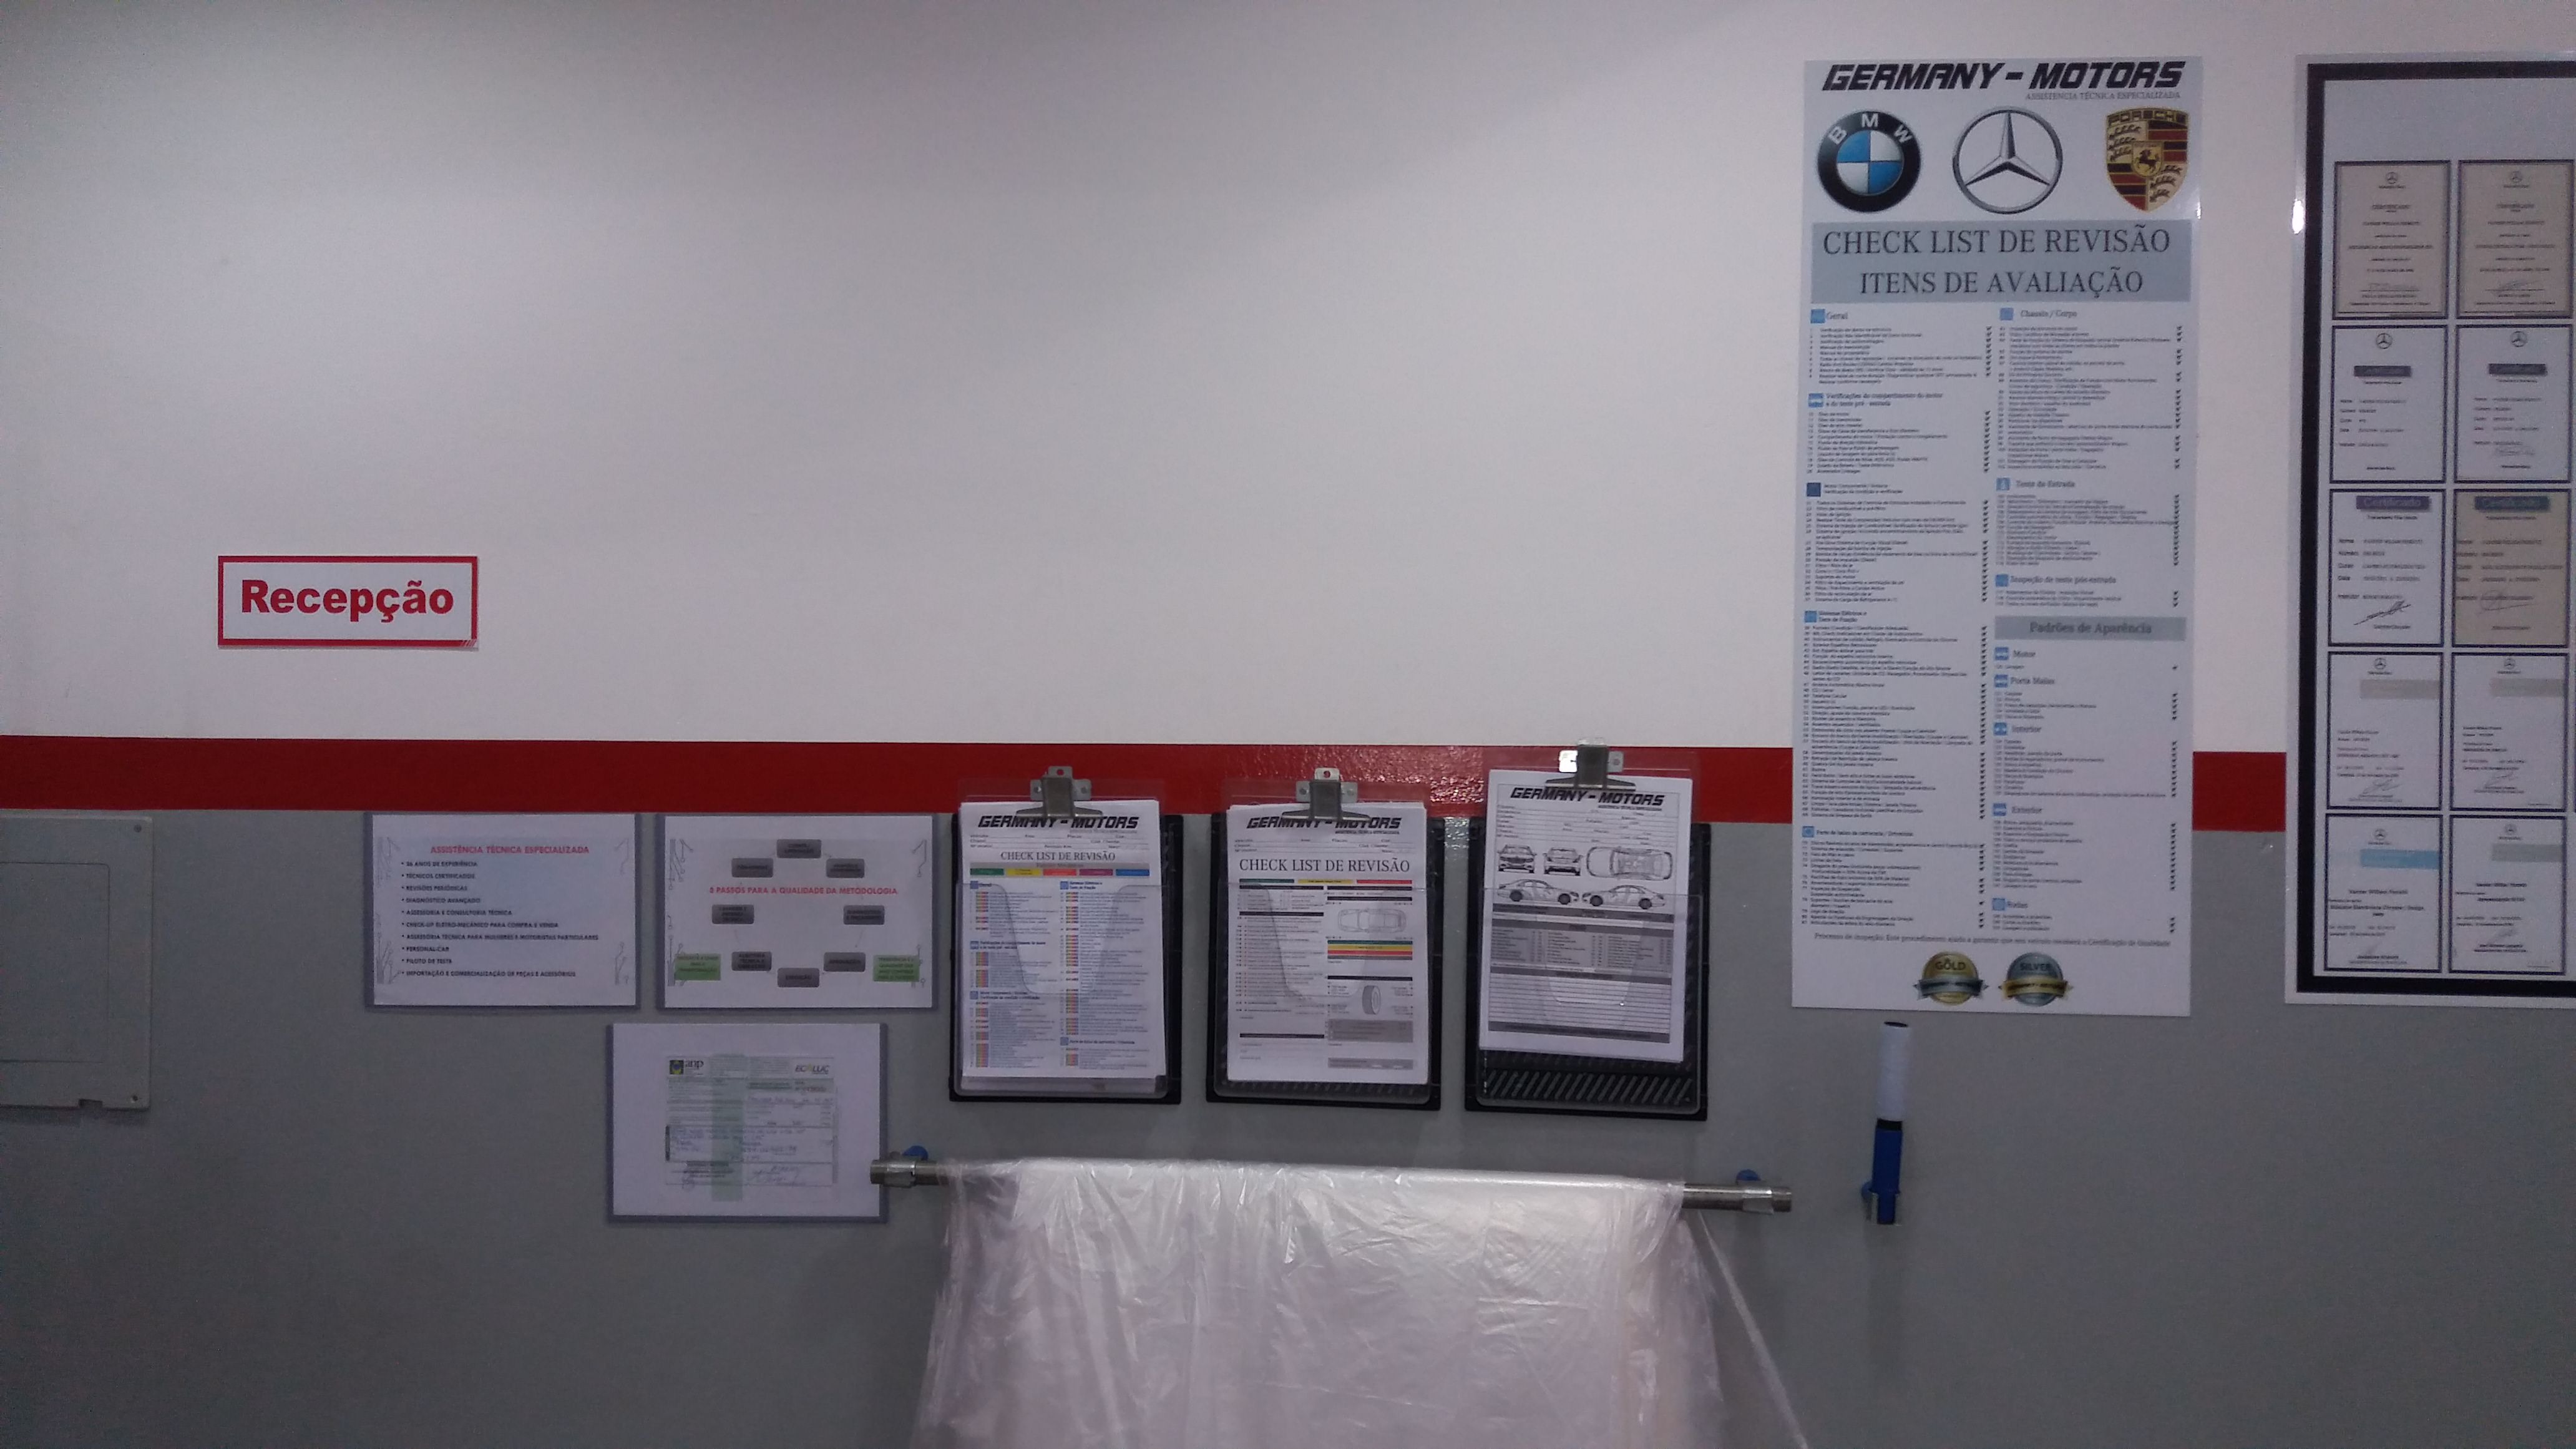 STUTTGART-MOTORS ( Assistência Técnica Especializada / Santo André - ABC - BRASIL ) Proces10